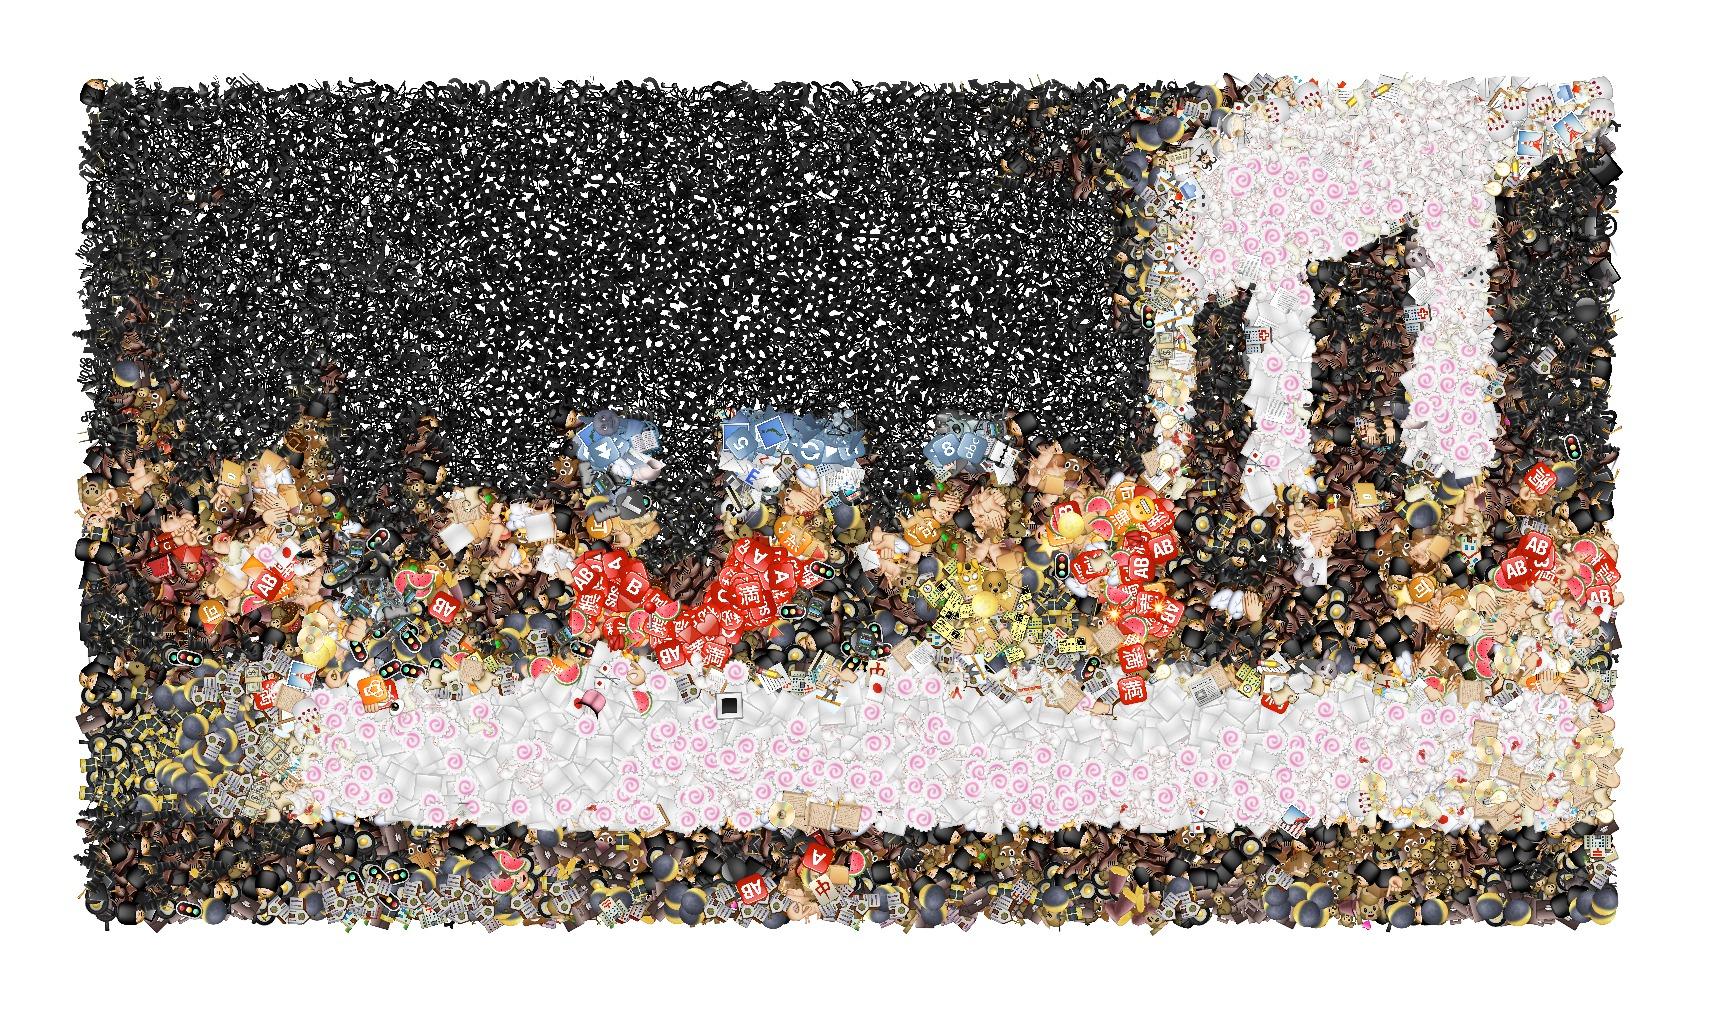 emoji-mosaic (7)